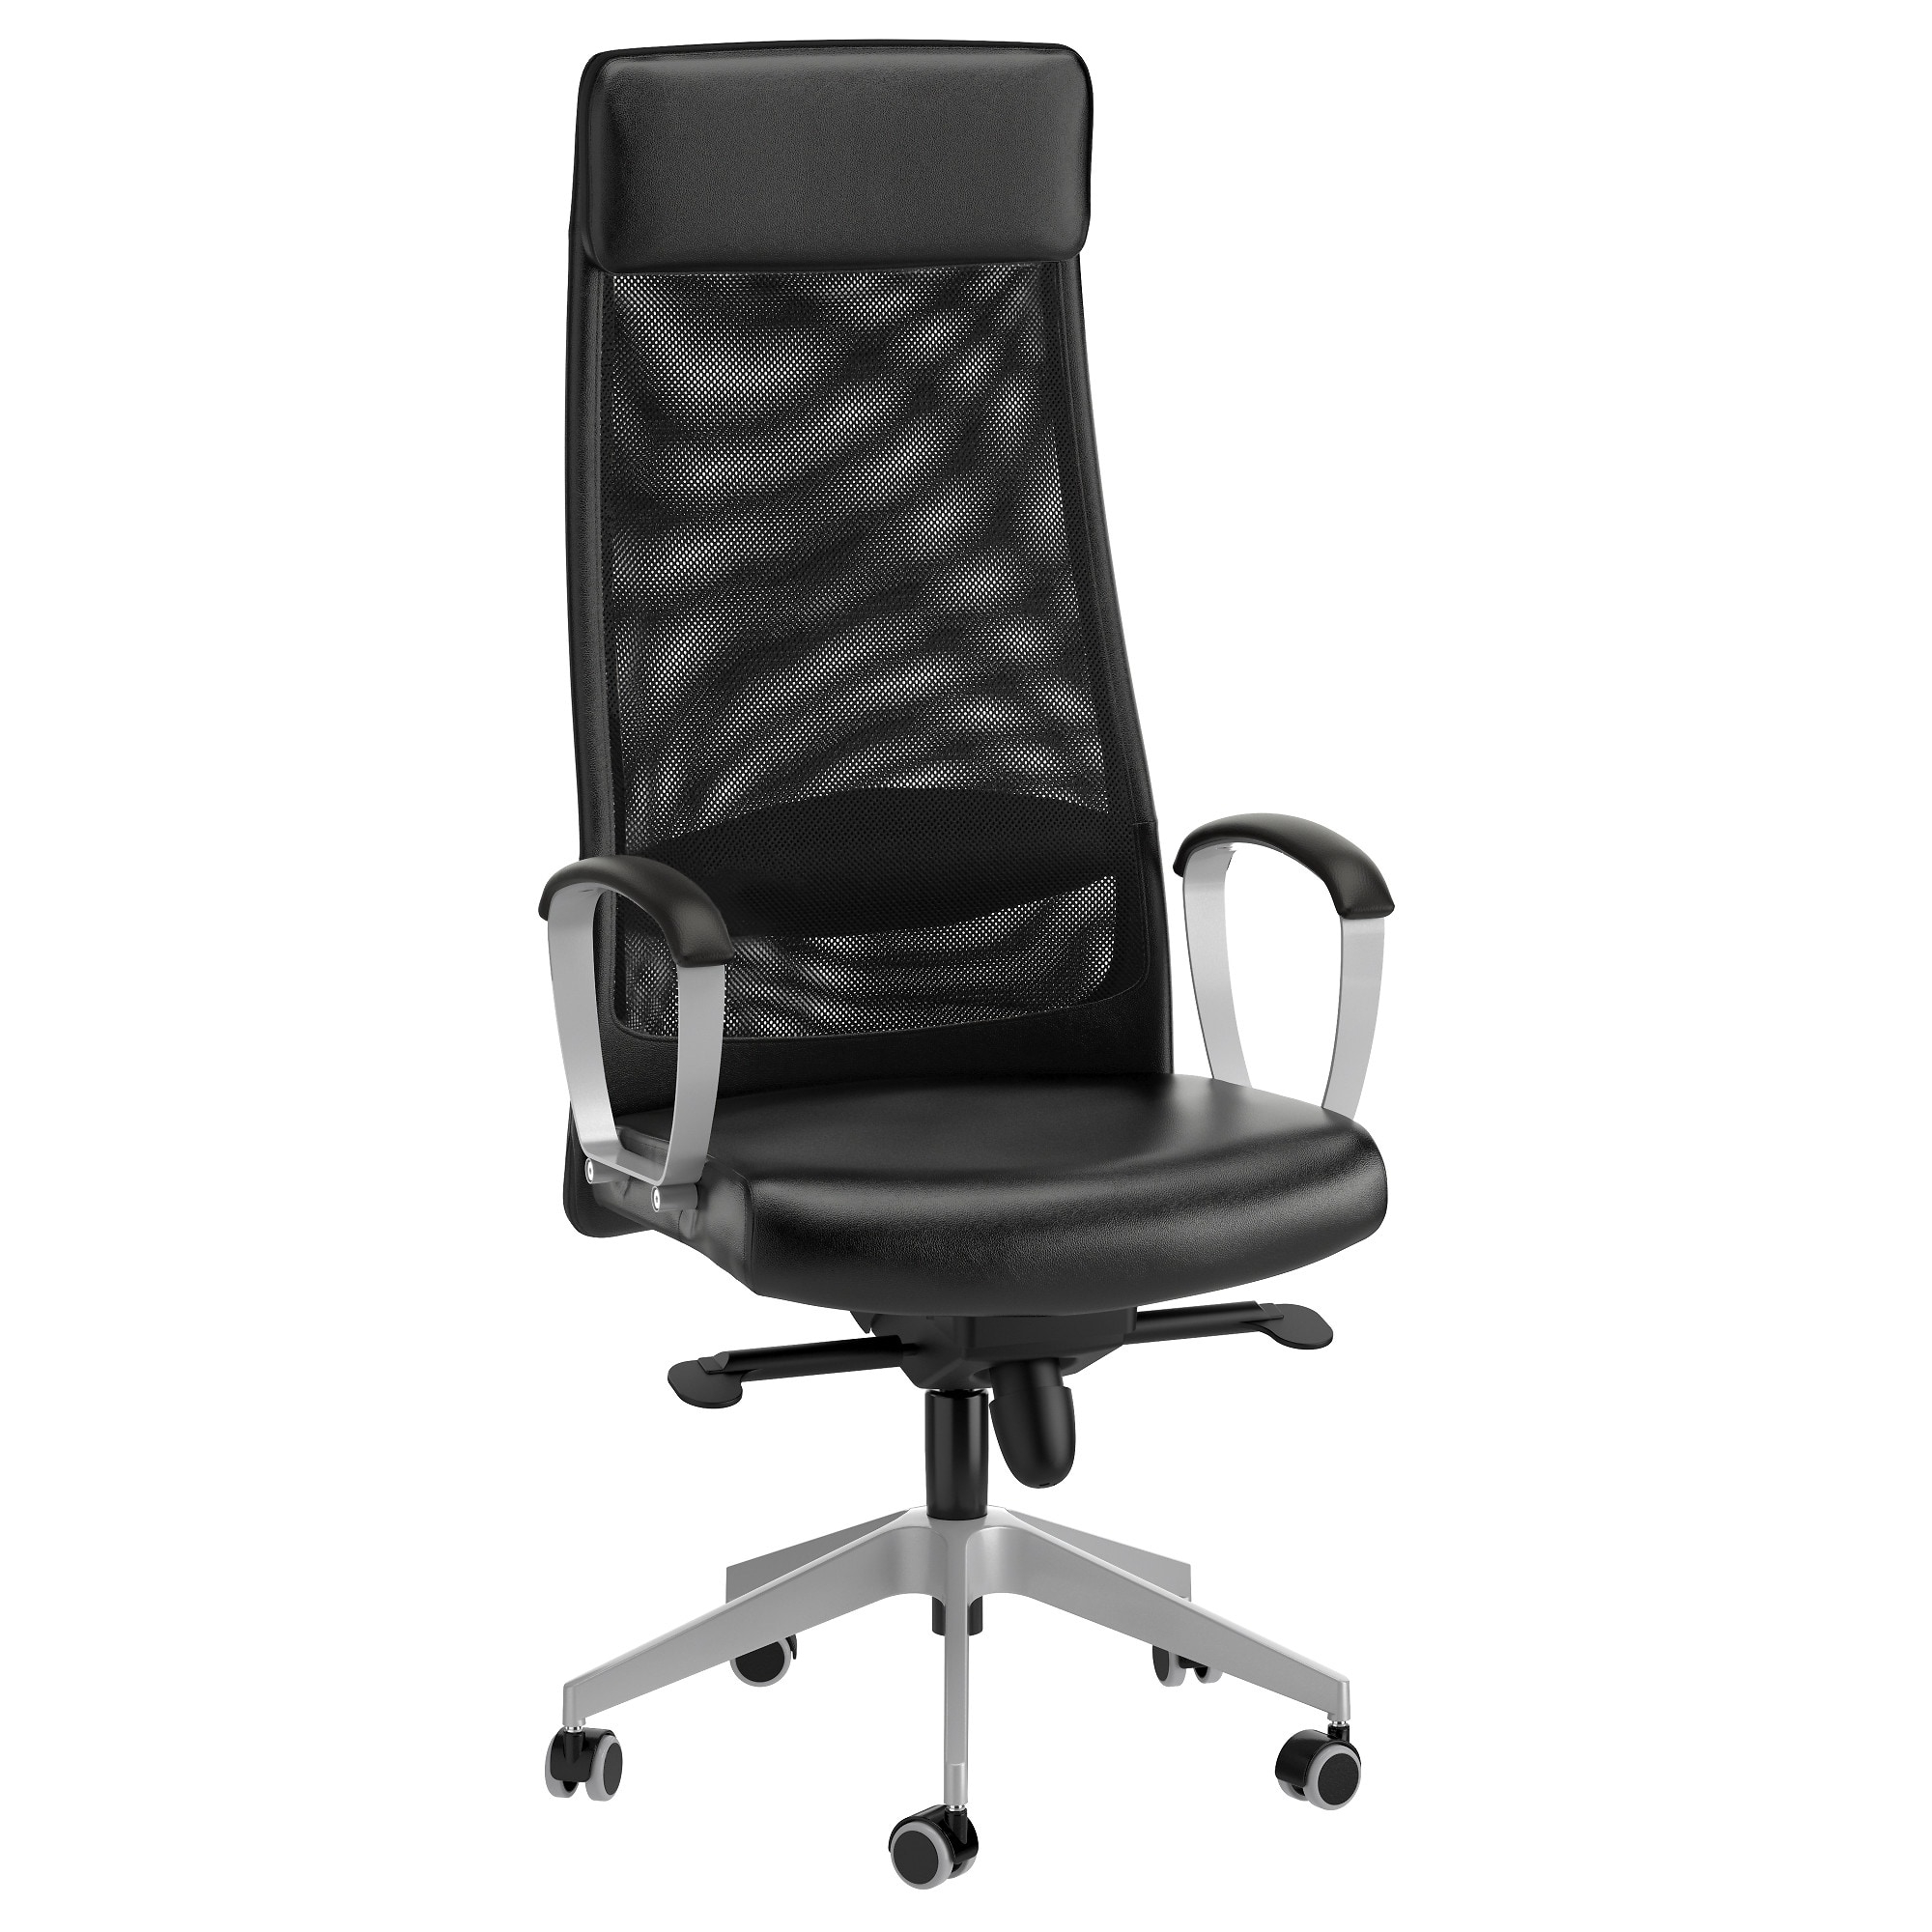 Silla De Oficina Ikea Dwdk Markus Swivel Chair Glose Black Ikea